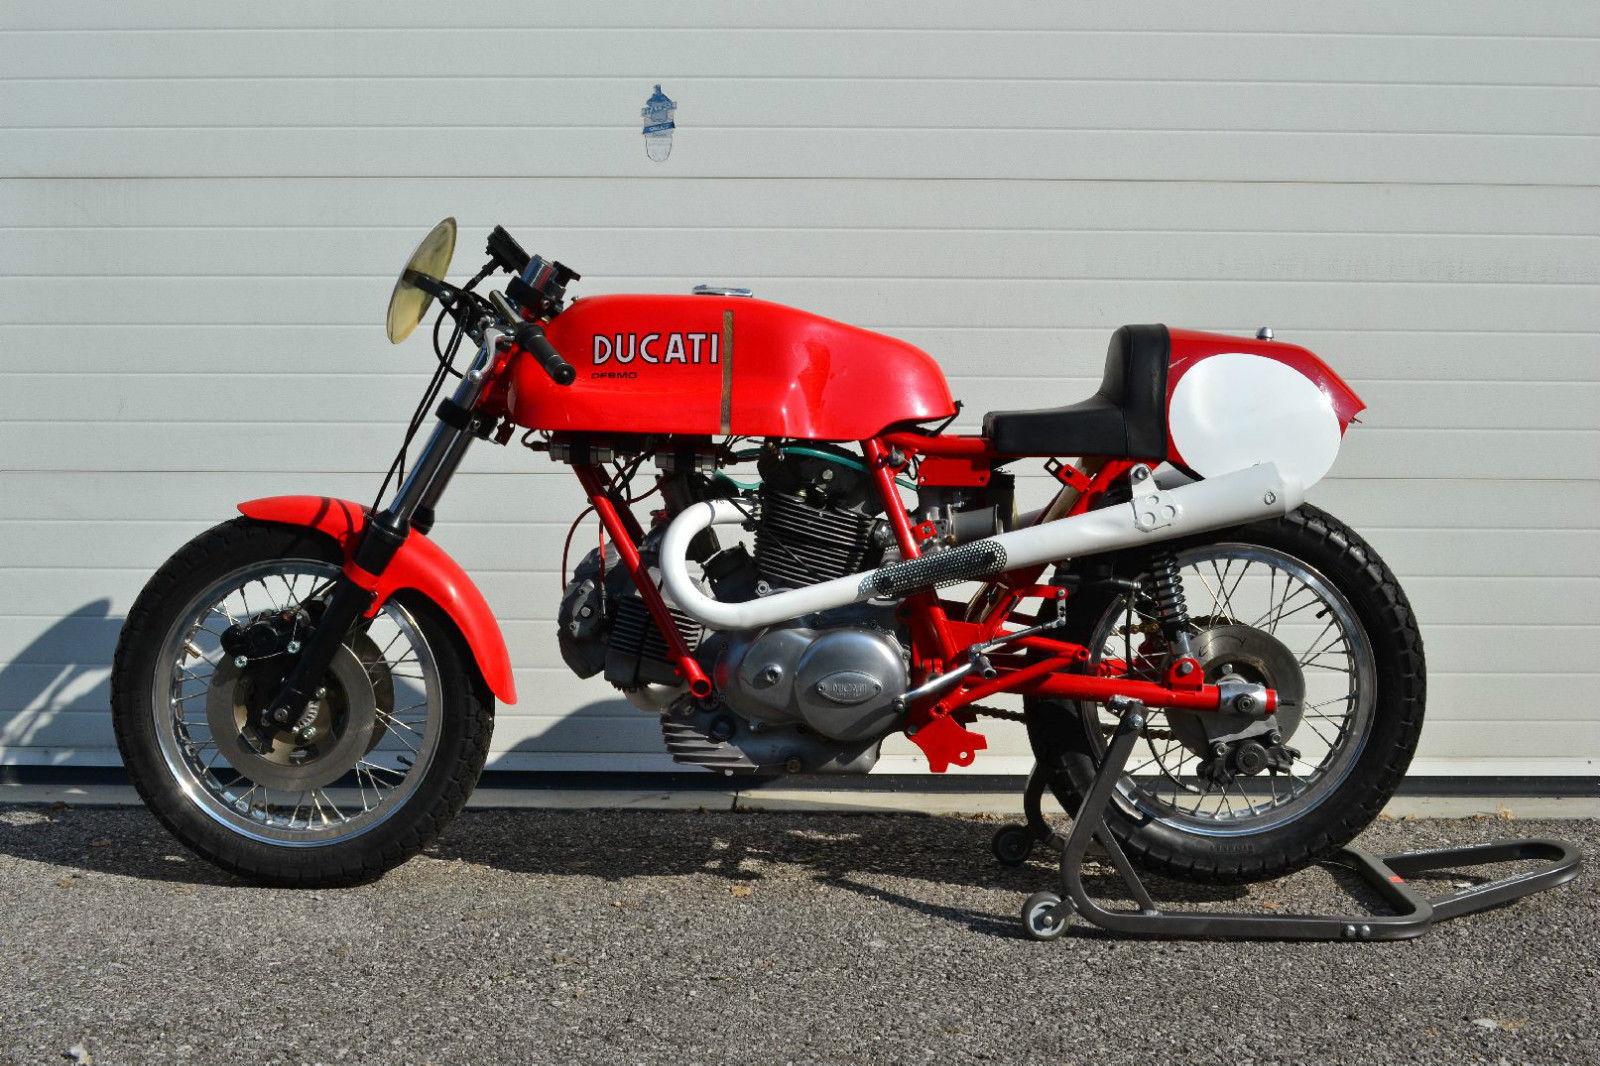 1974 ducati 750ss | bike-urious